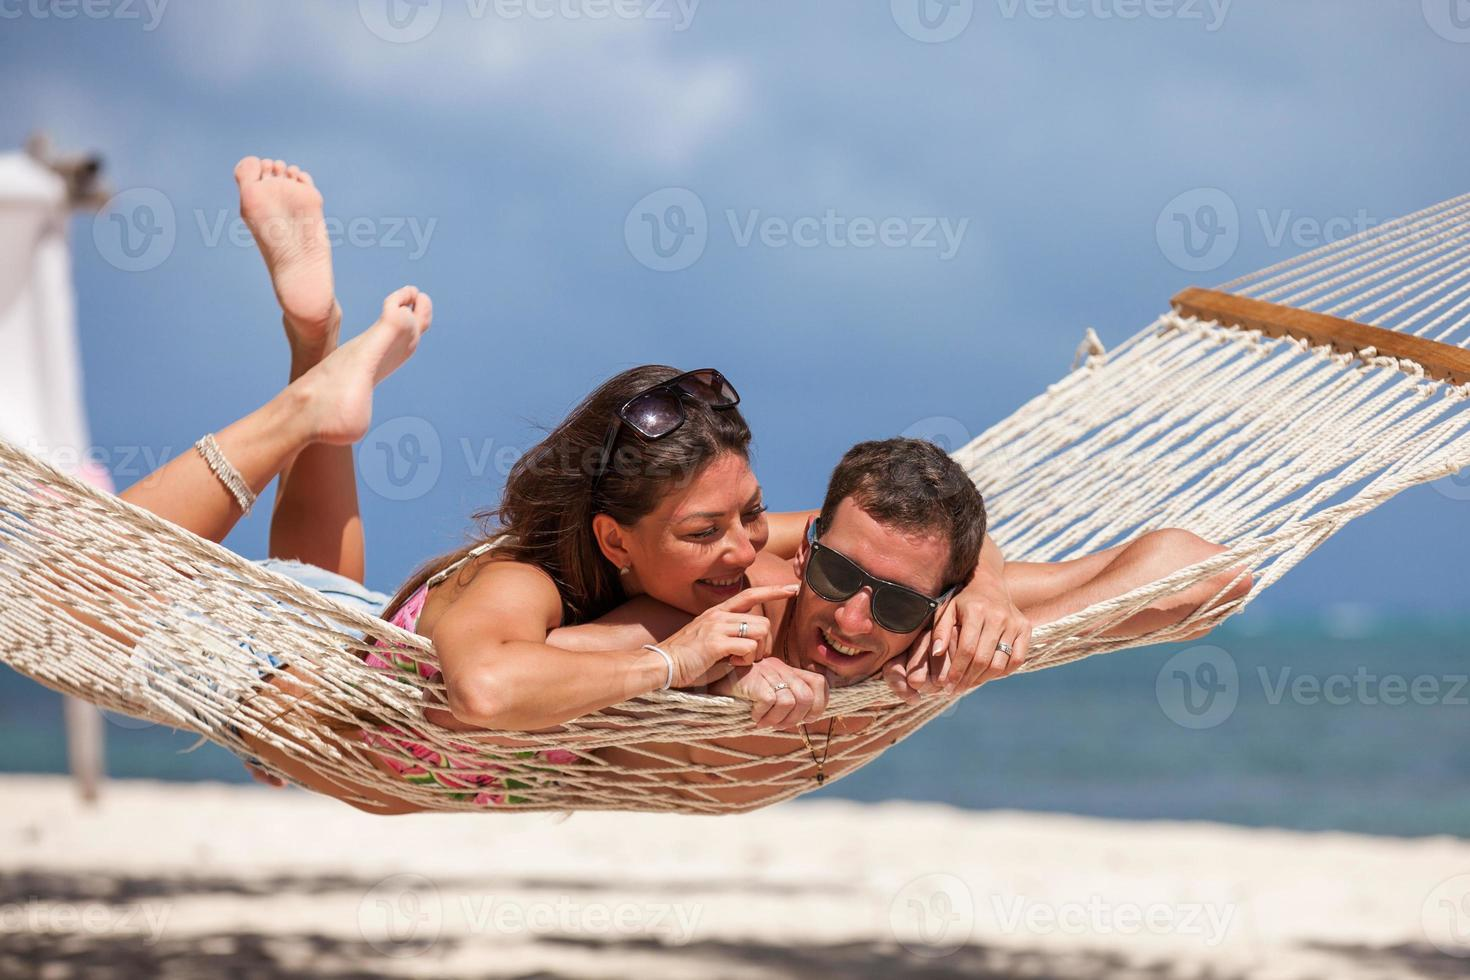 romantisch paar ontspannen in strand hangmat foto